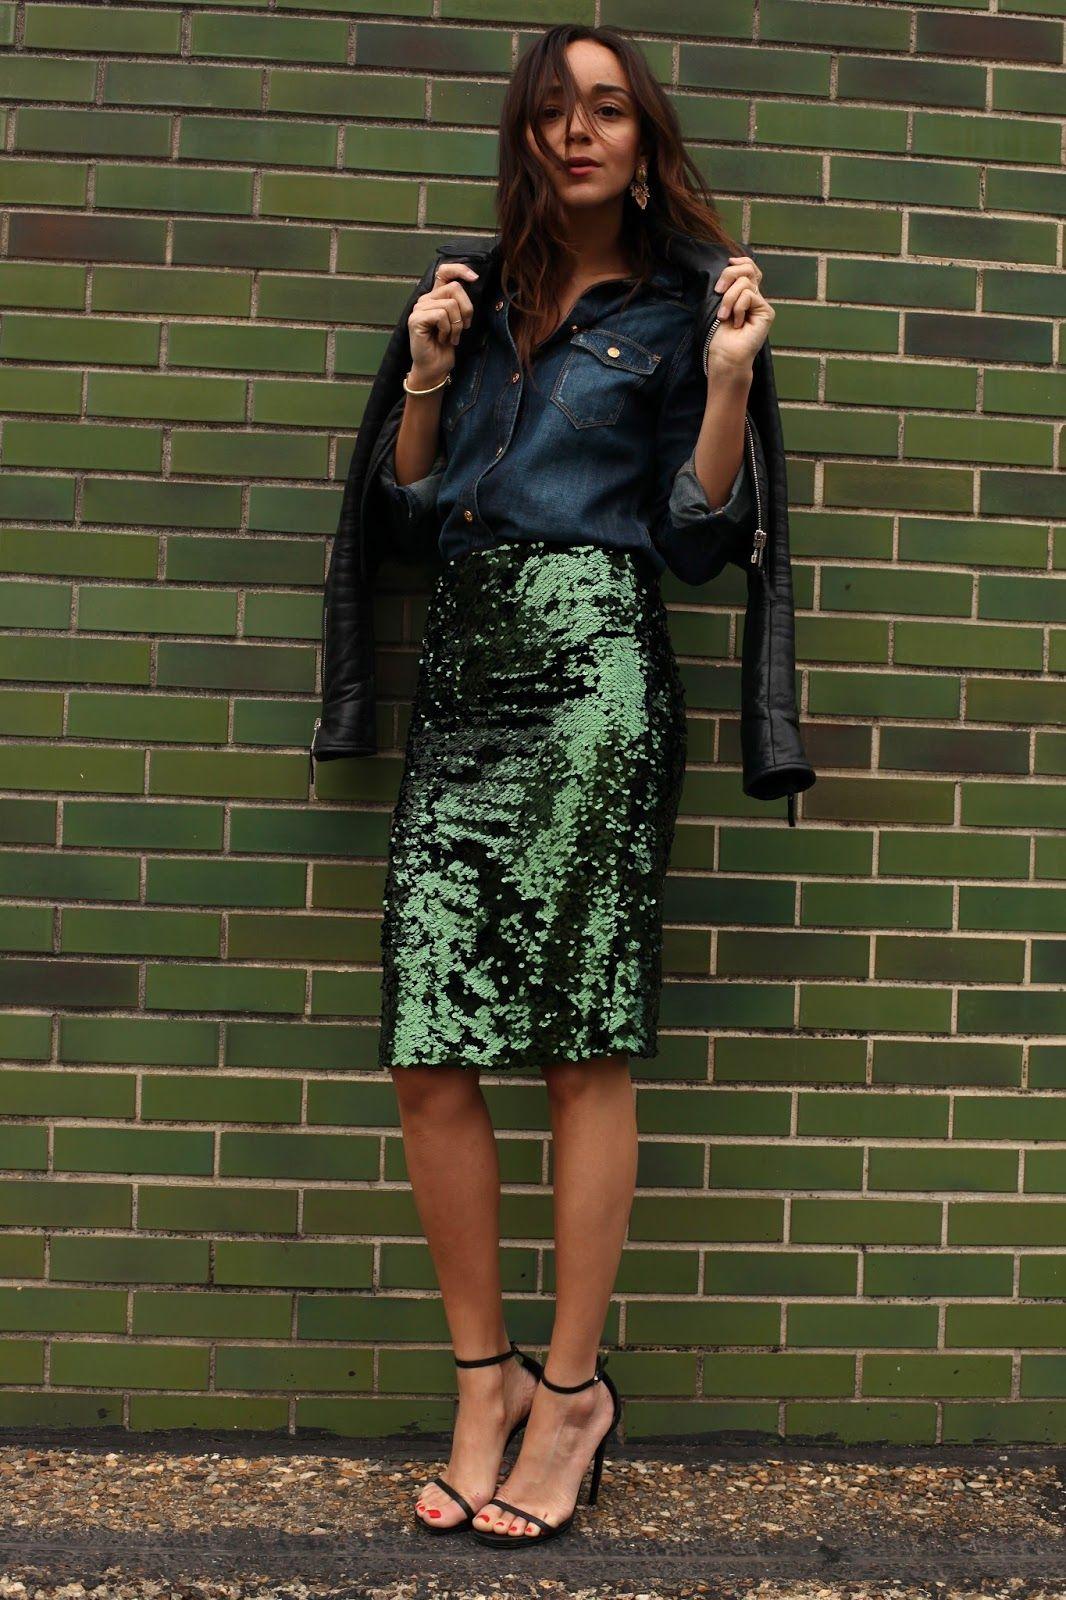 Green dress denim jacket  Skirt Topshop Denim Shirt  For All Mankind Sandals Saint